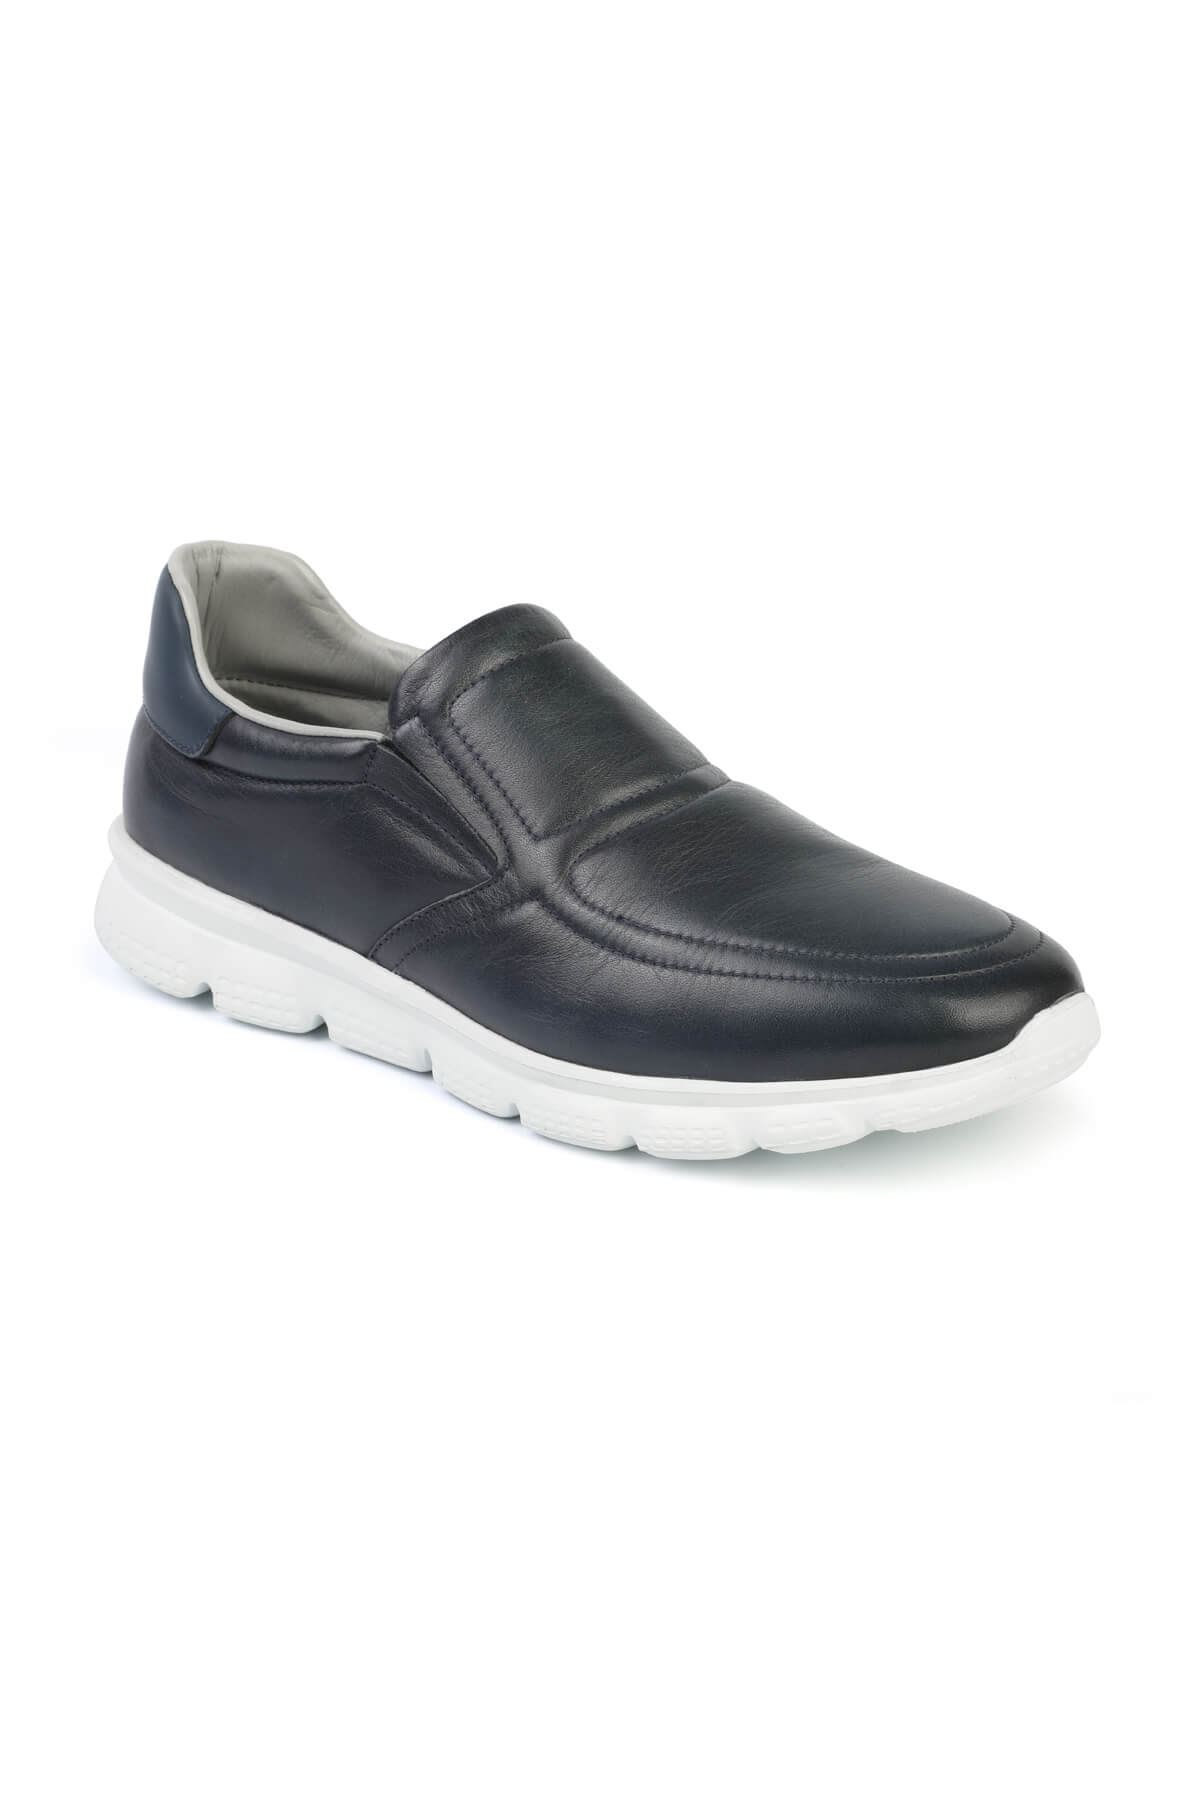 Libero 3122 Navy Blue Sport Shoes